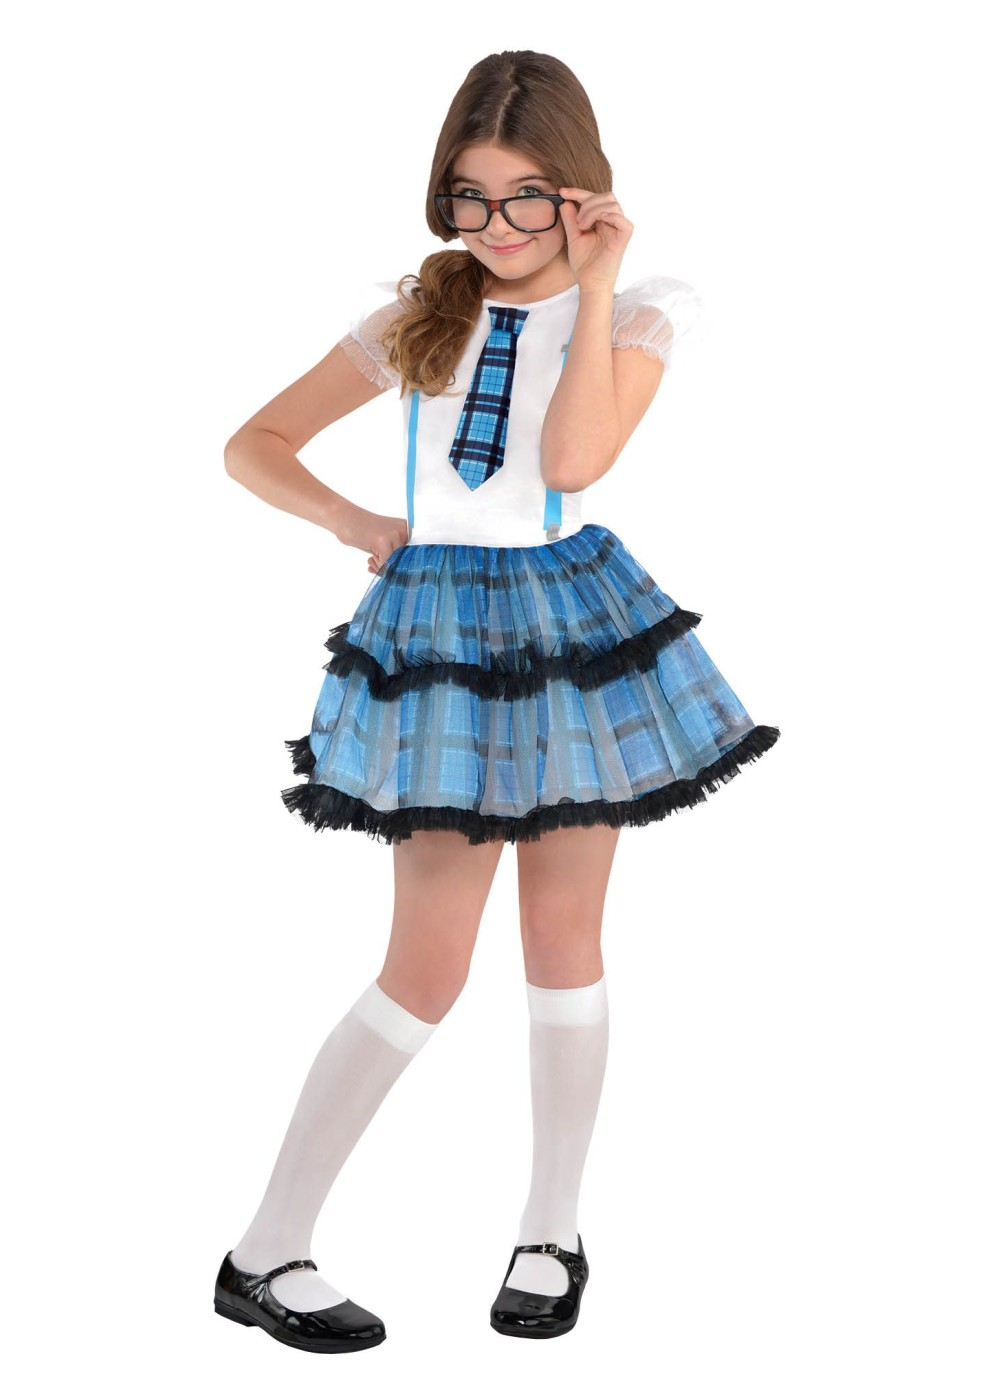 Geek Chic Tutu Dress - Funny Costumes